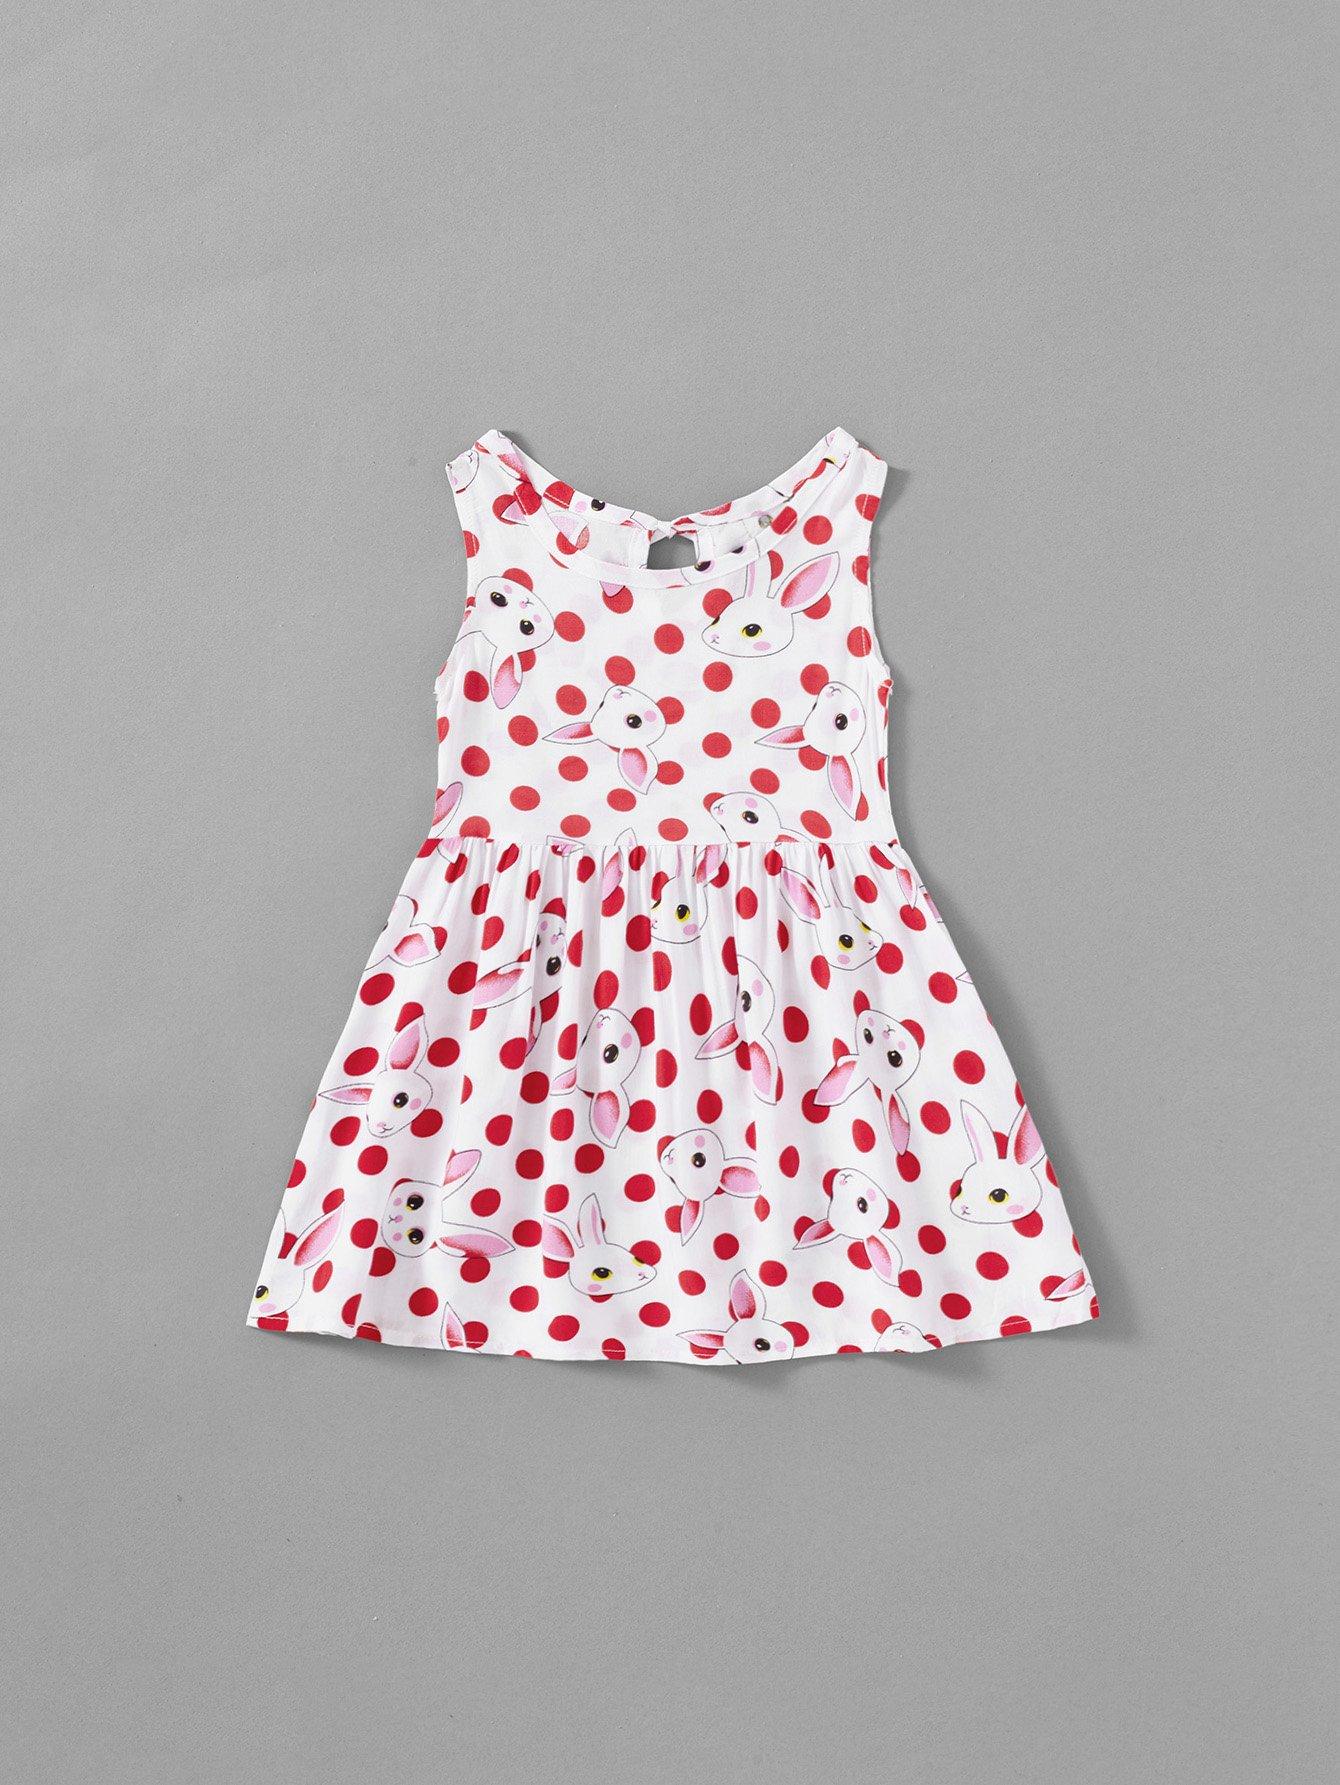 Rabbit Print Polka Dot Tie Back Dress rabbit print polka dot tie back dress